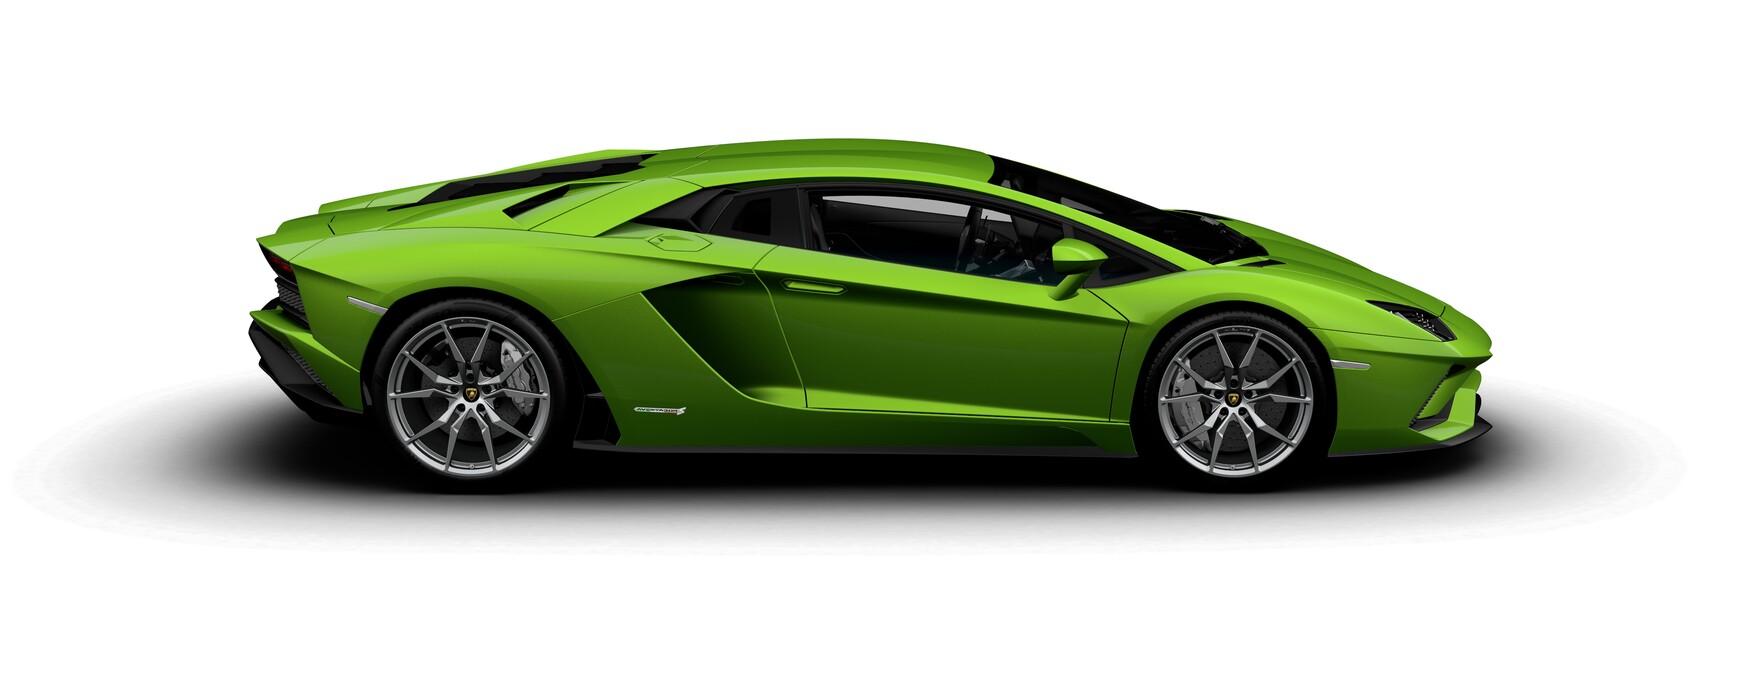 Lamborghini Aventador S Coupe pearl Verde Mantis side view